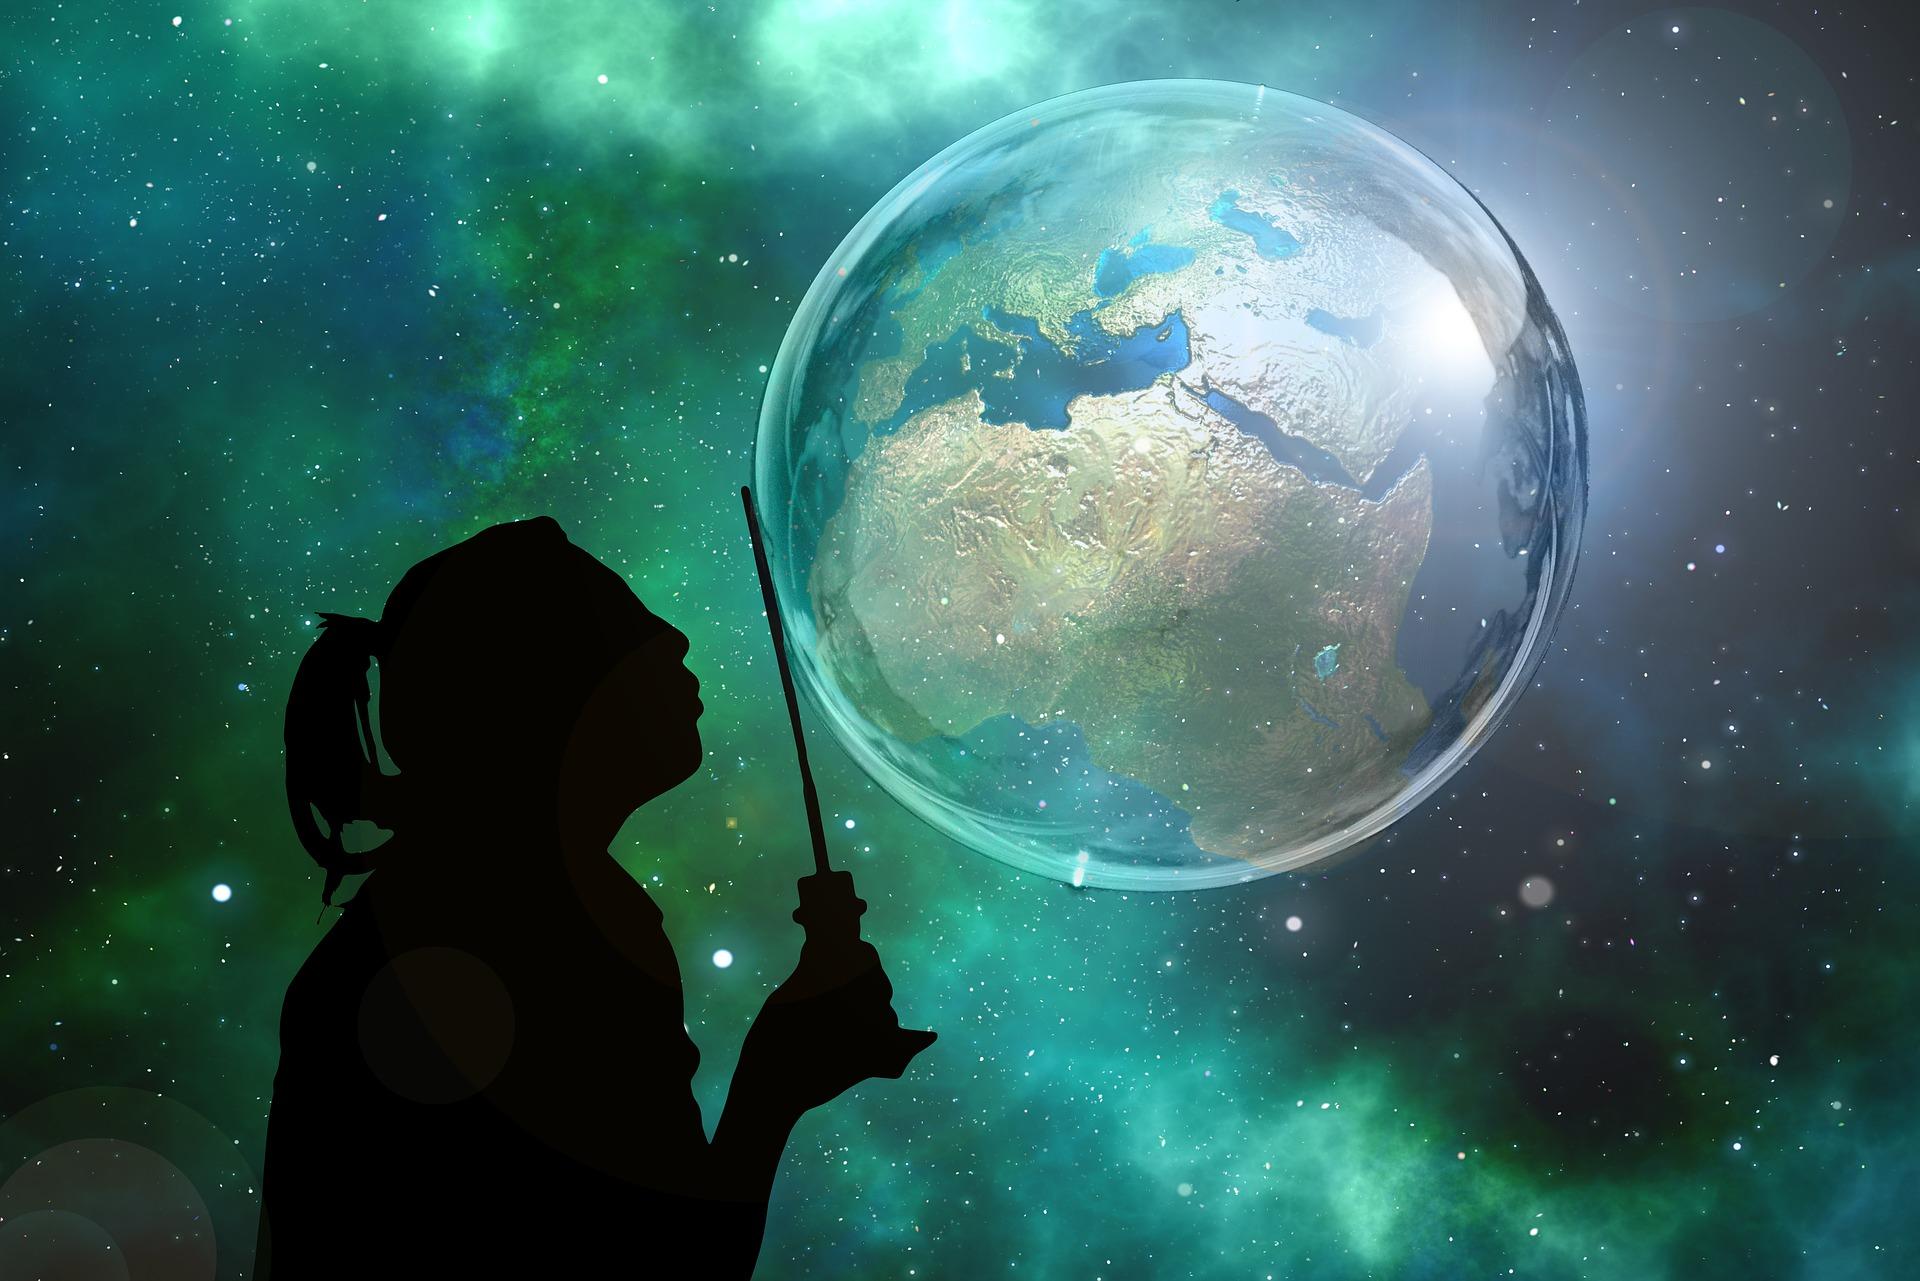 World as a bubble